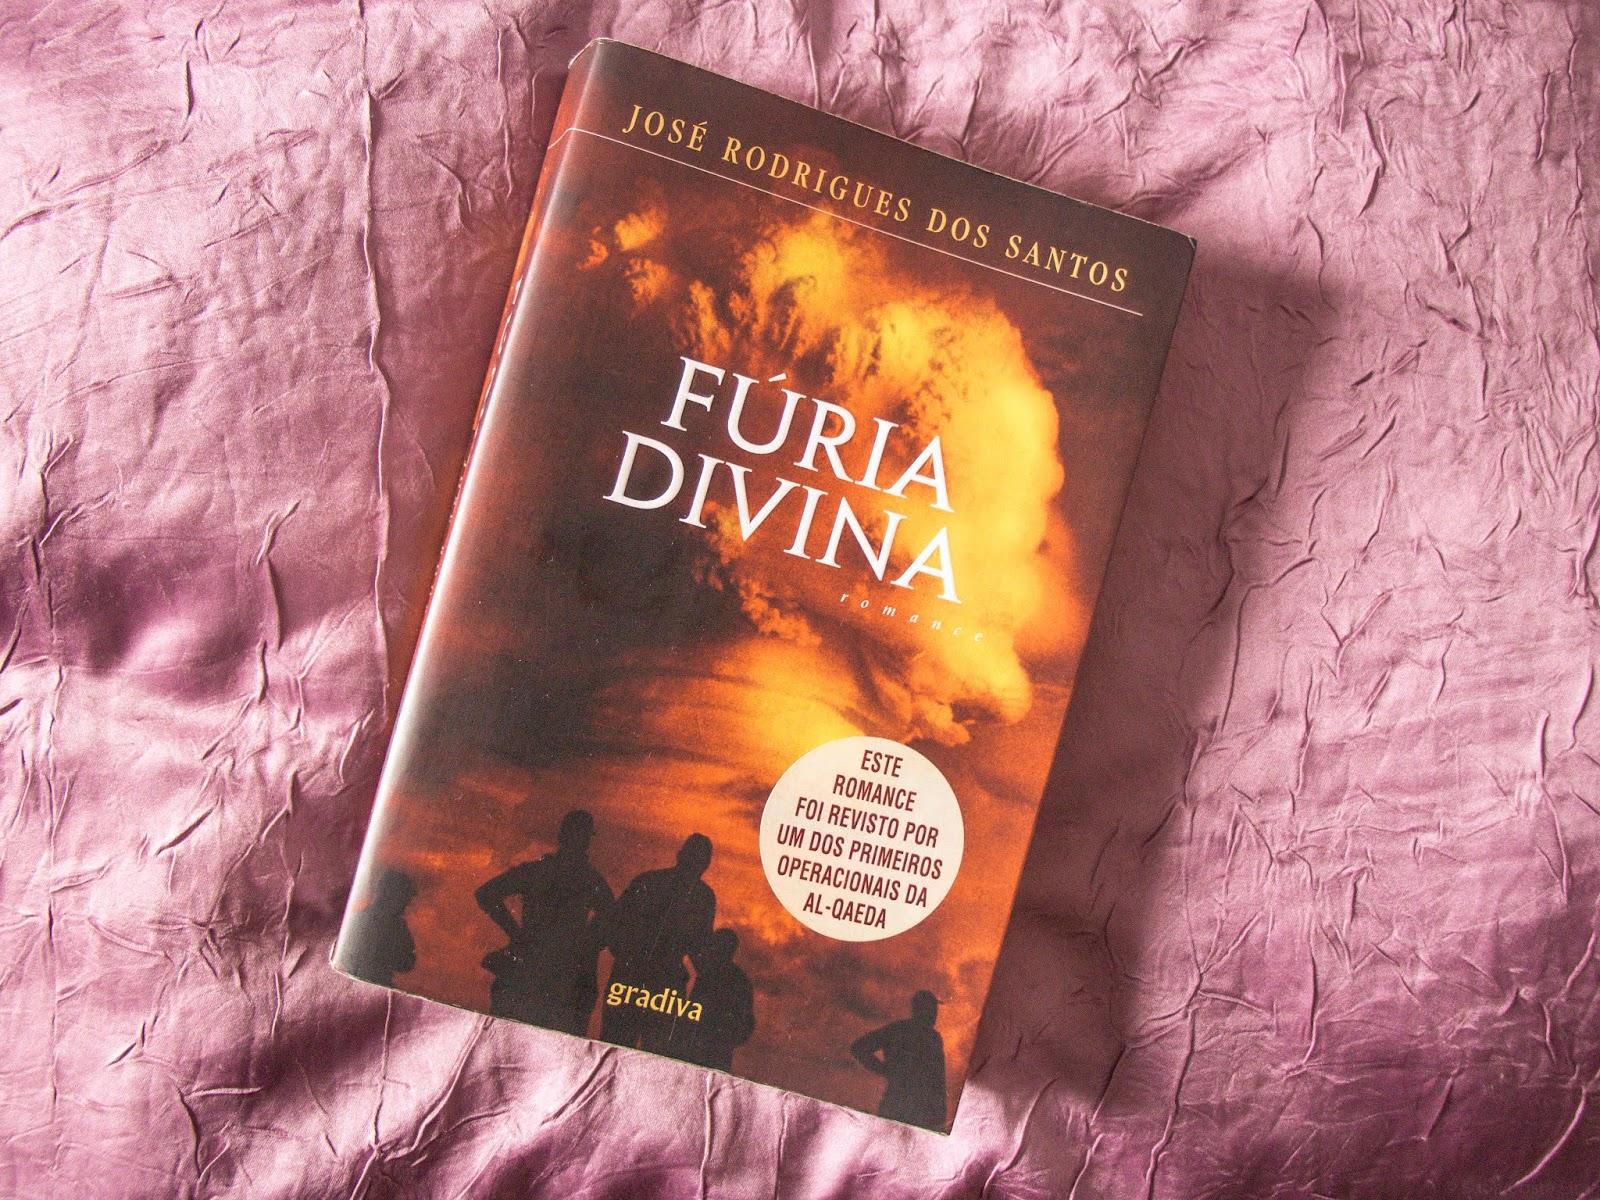 The Bibliophile Club: Fúria Divina - José Rodrigues dos Santos